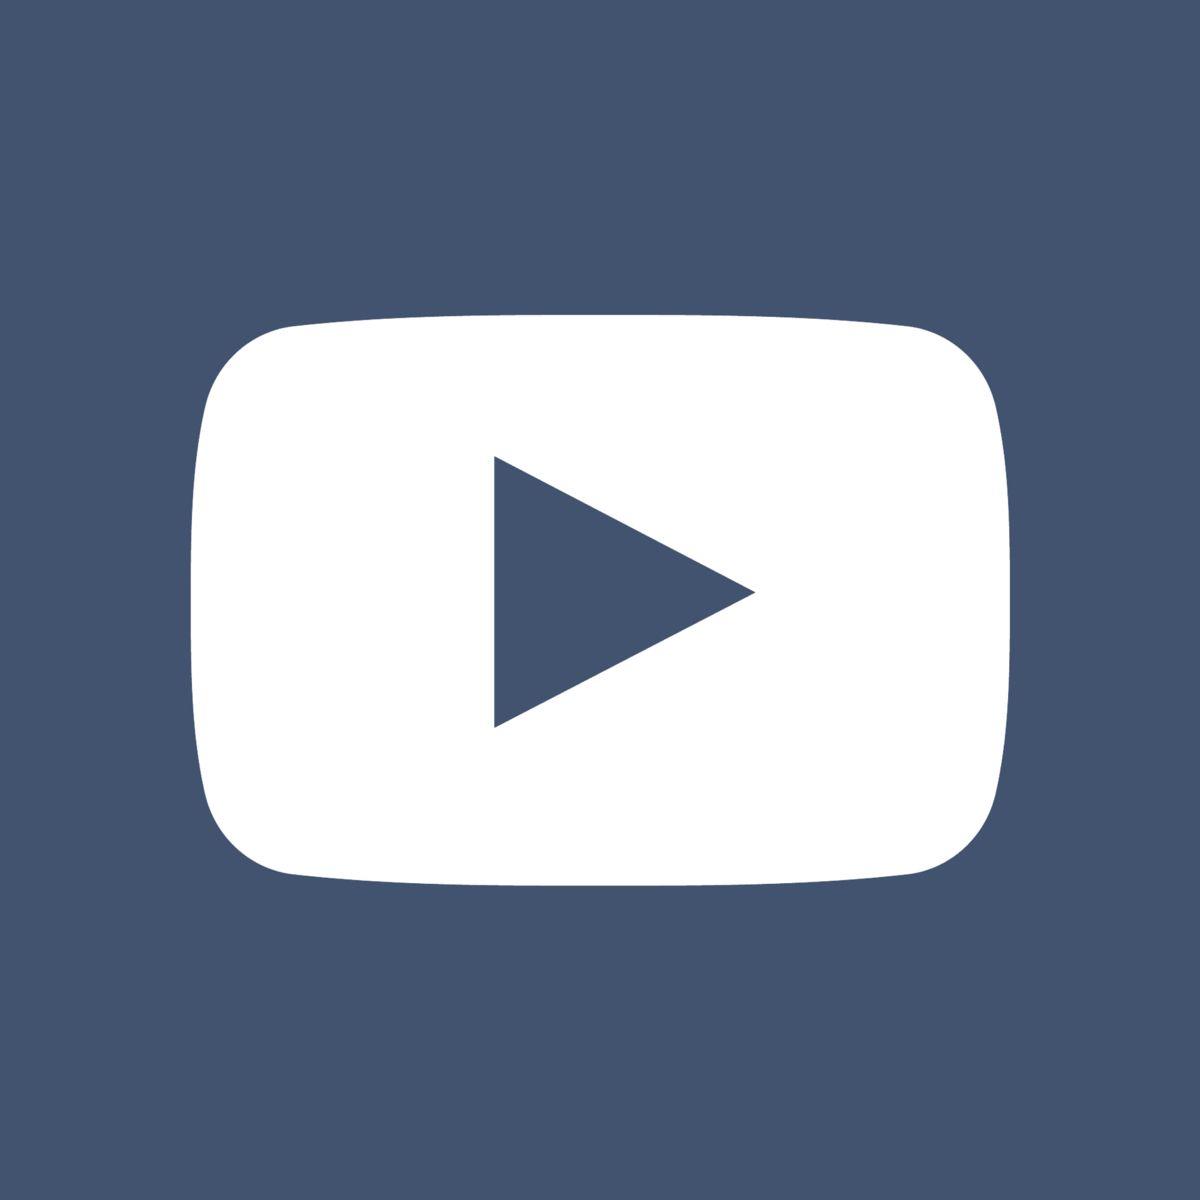 Youtube In 2021 Iphone Photo App Iphone Icon Ios App Icon